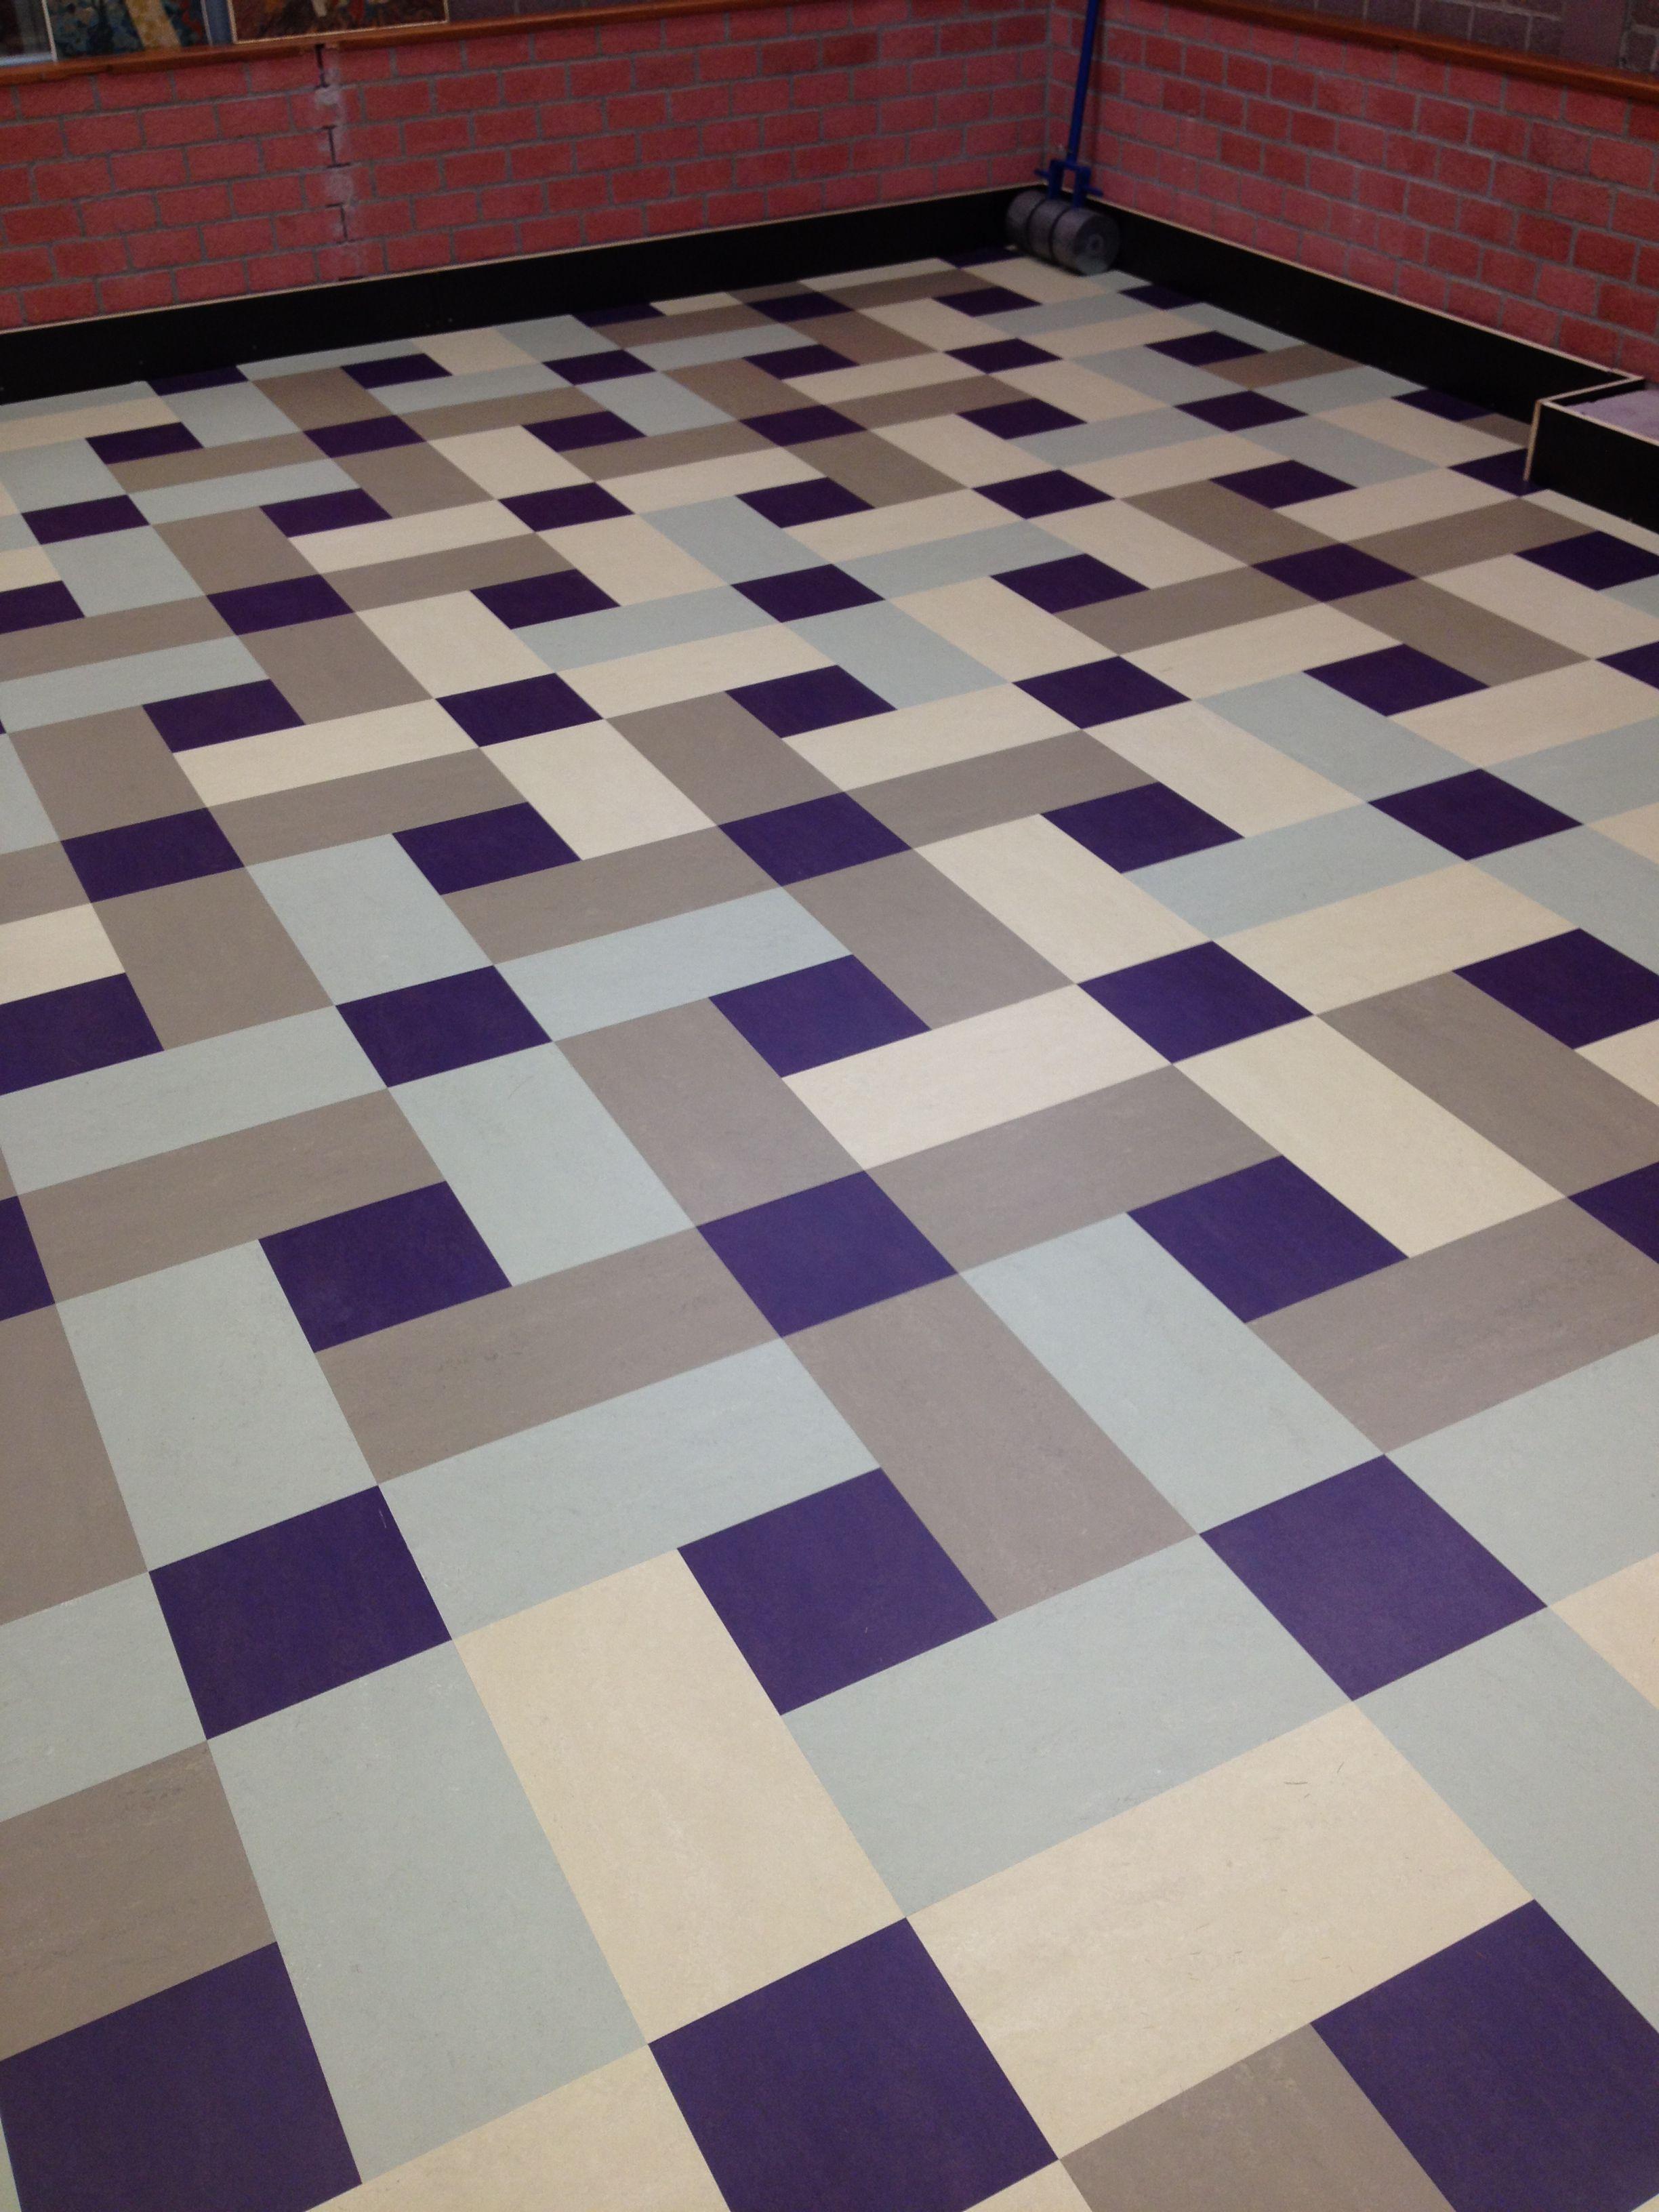 Marmoleum Modular Tiles Patterned Kitchen Tiles Flooring Vct Tile